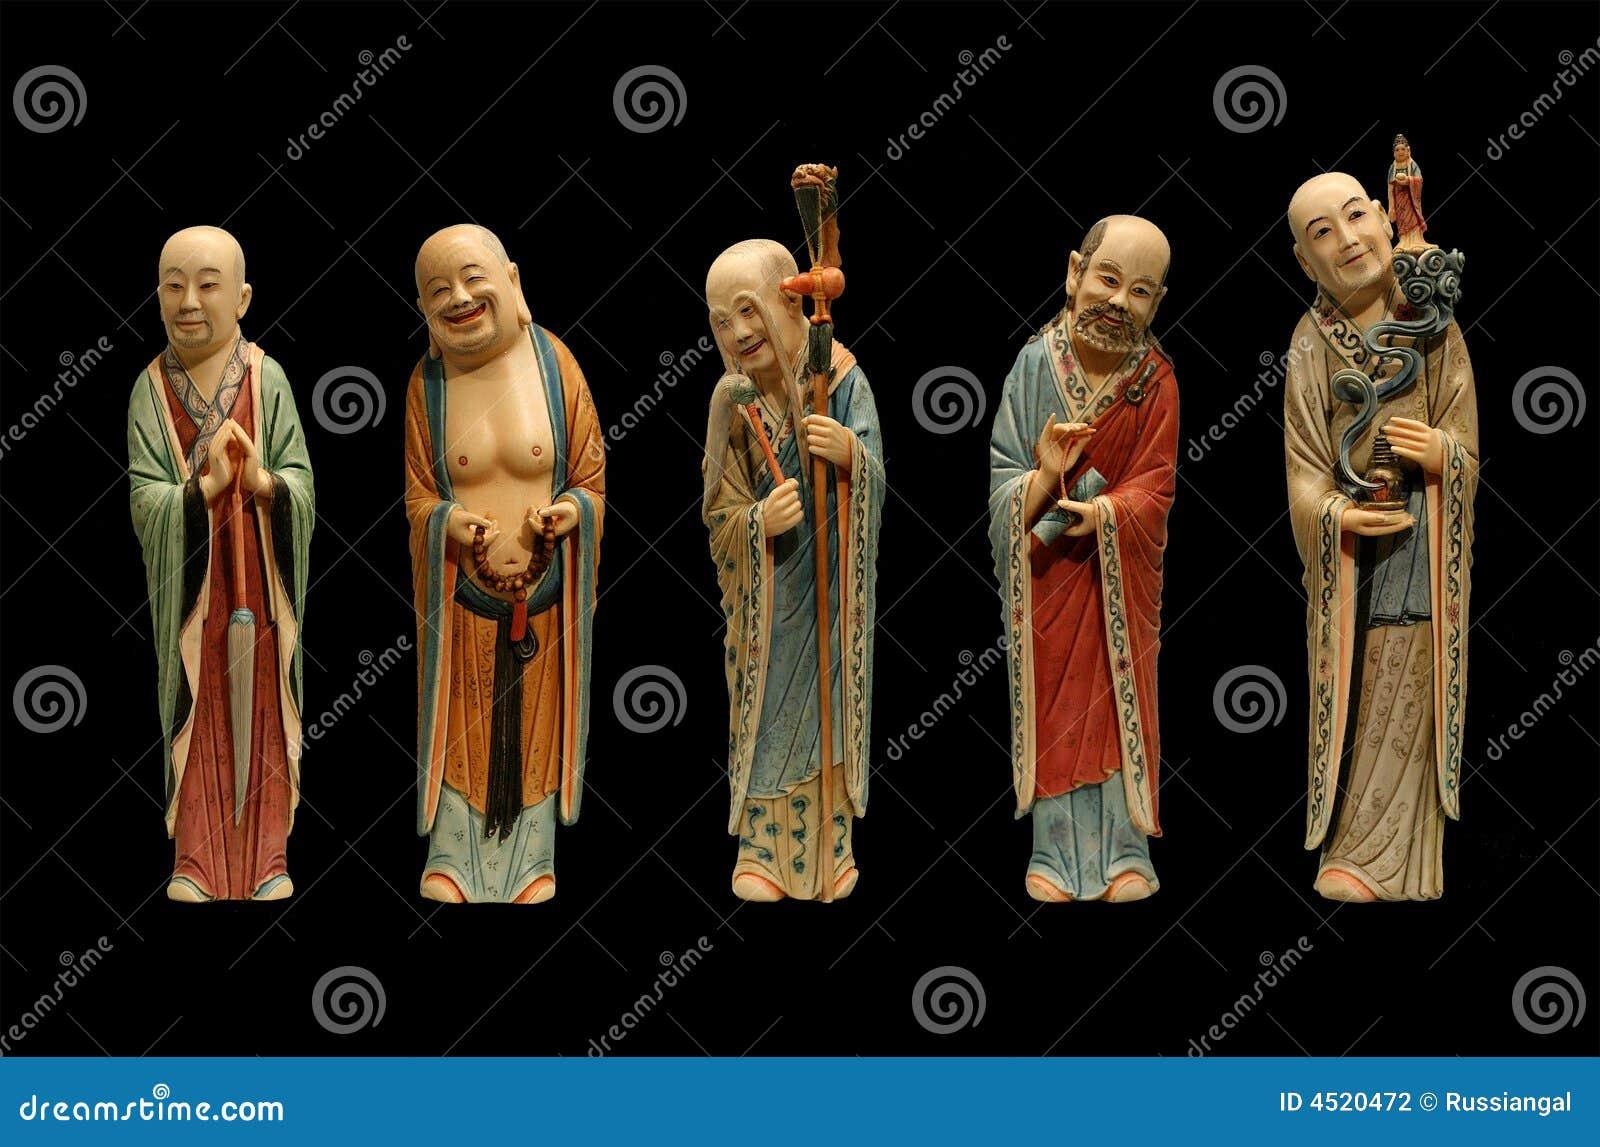 Five old men